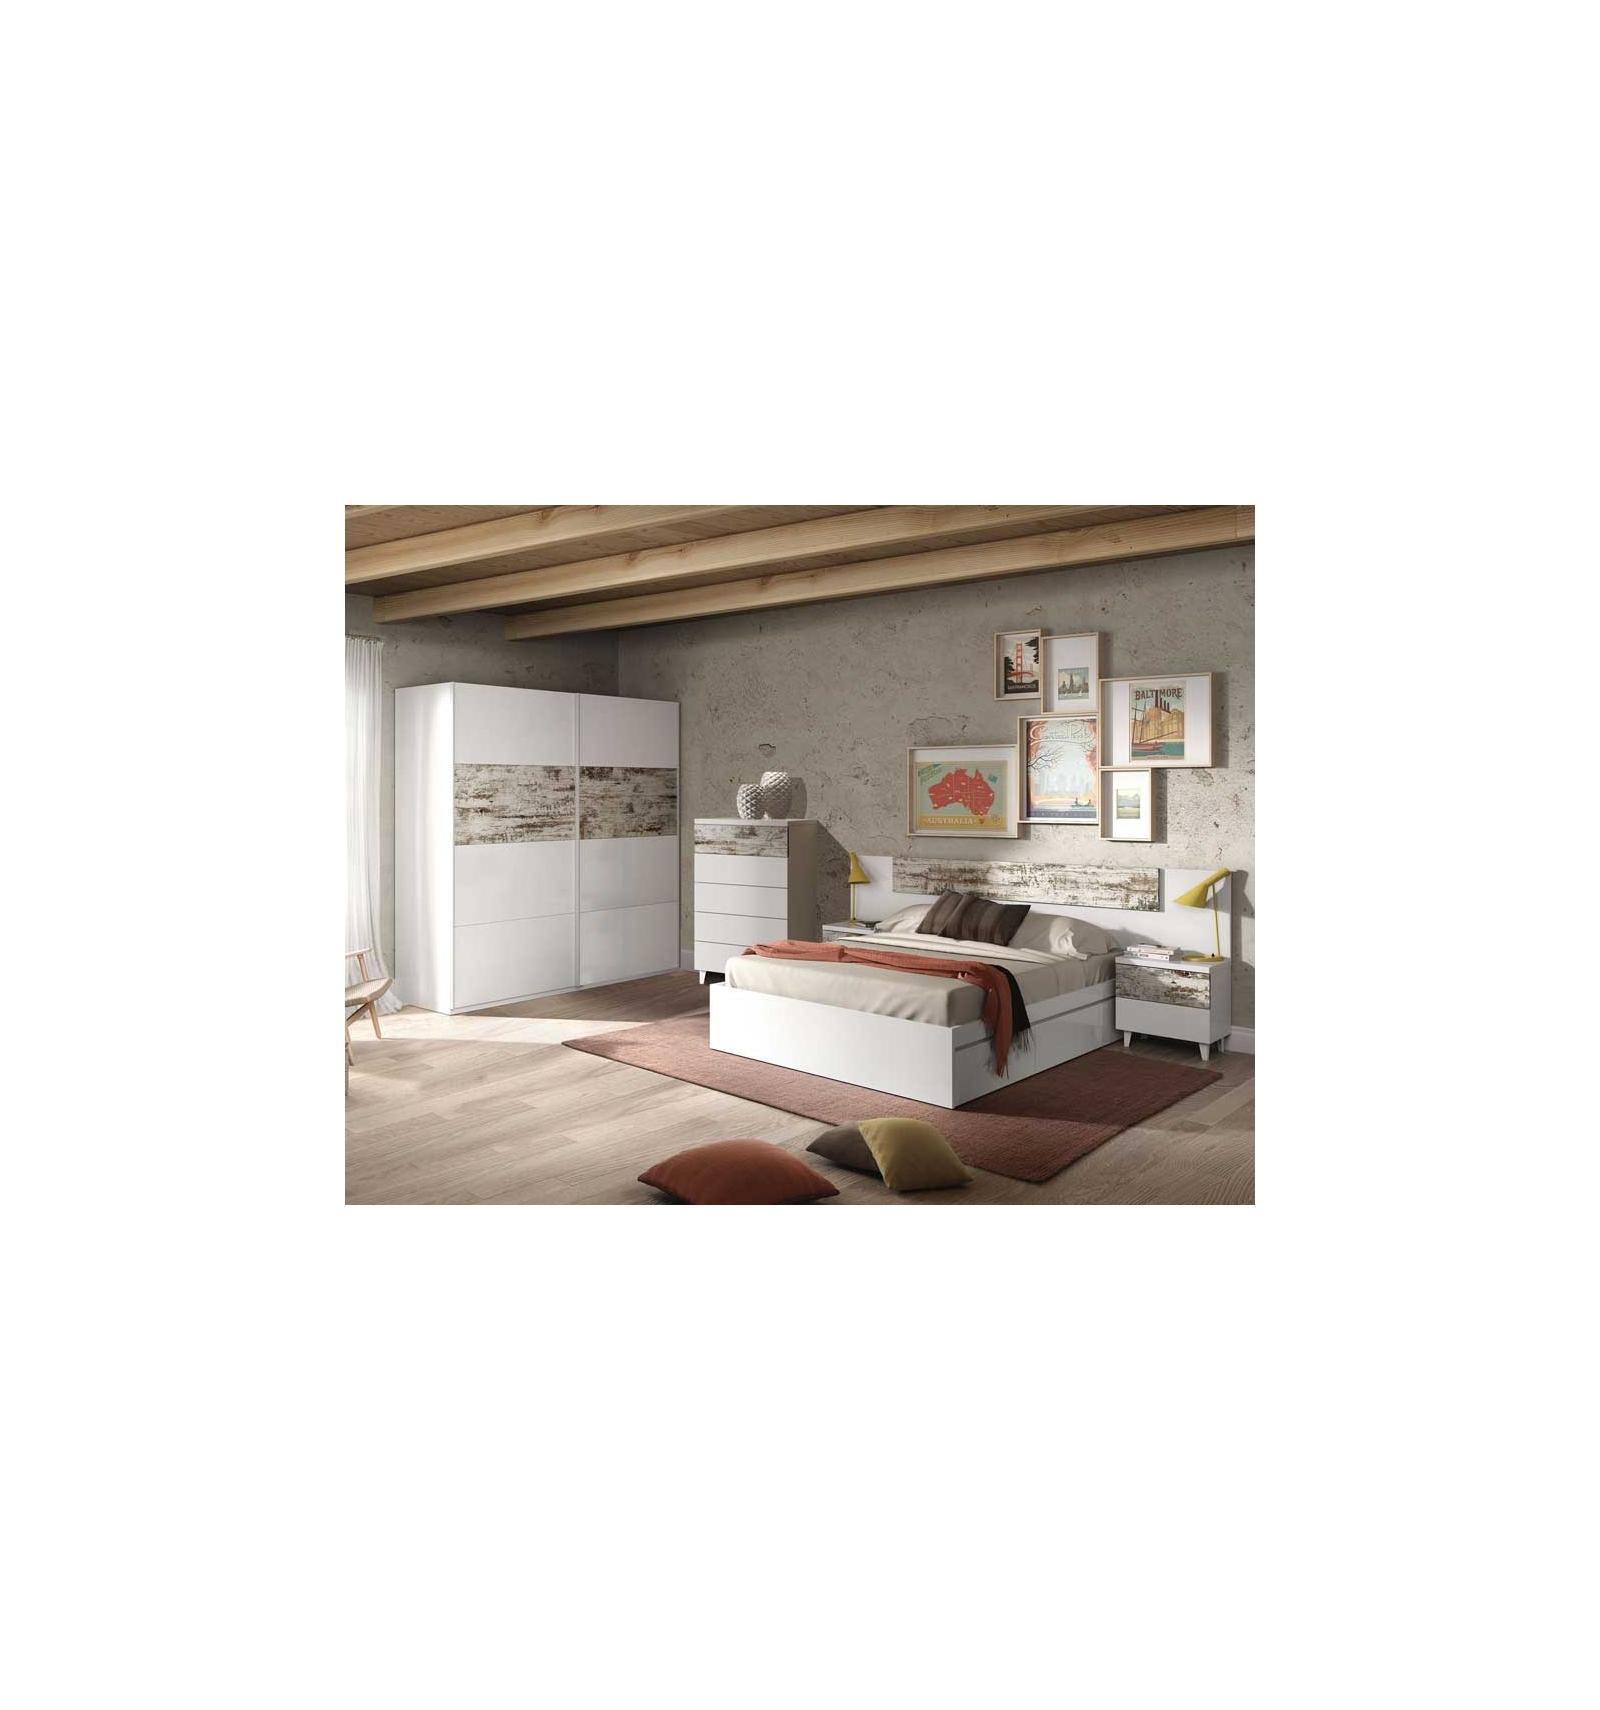 doppelbett mit schubladen moria. Black Bedroom Furniture Sets. Home Design Ideas